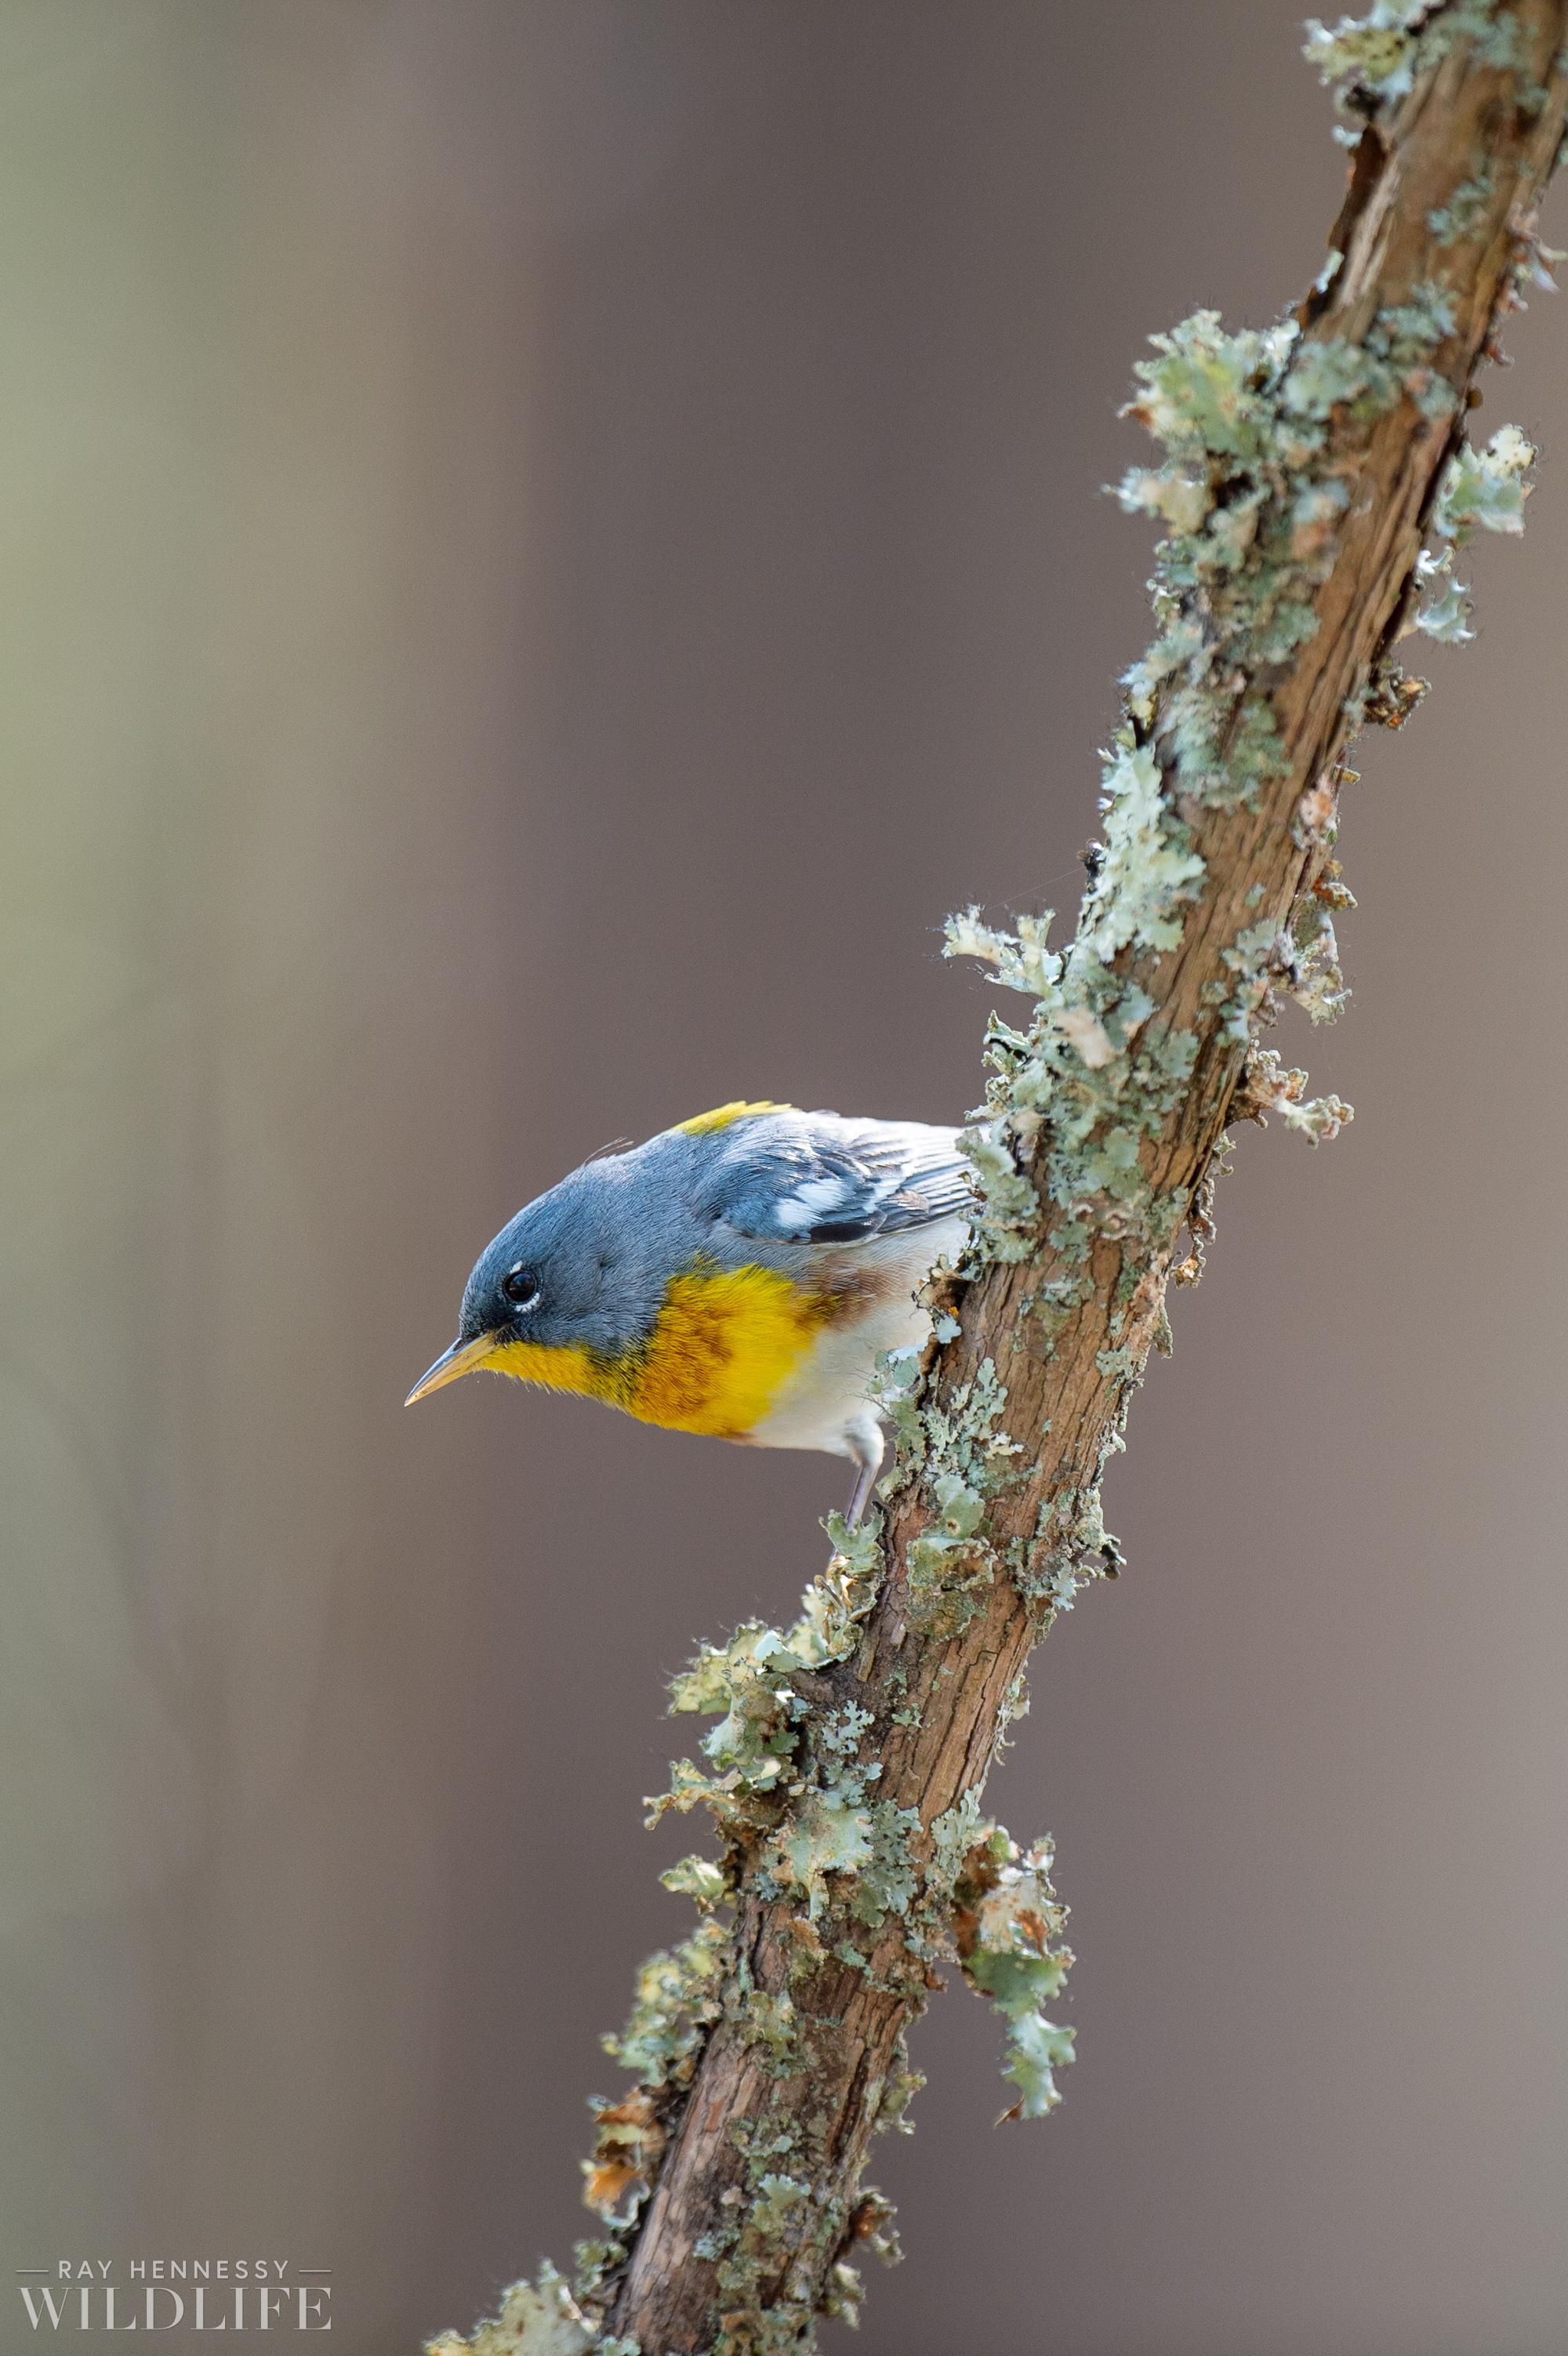 014_spring-warblers-new-jersey.jpg